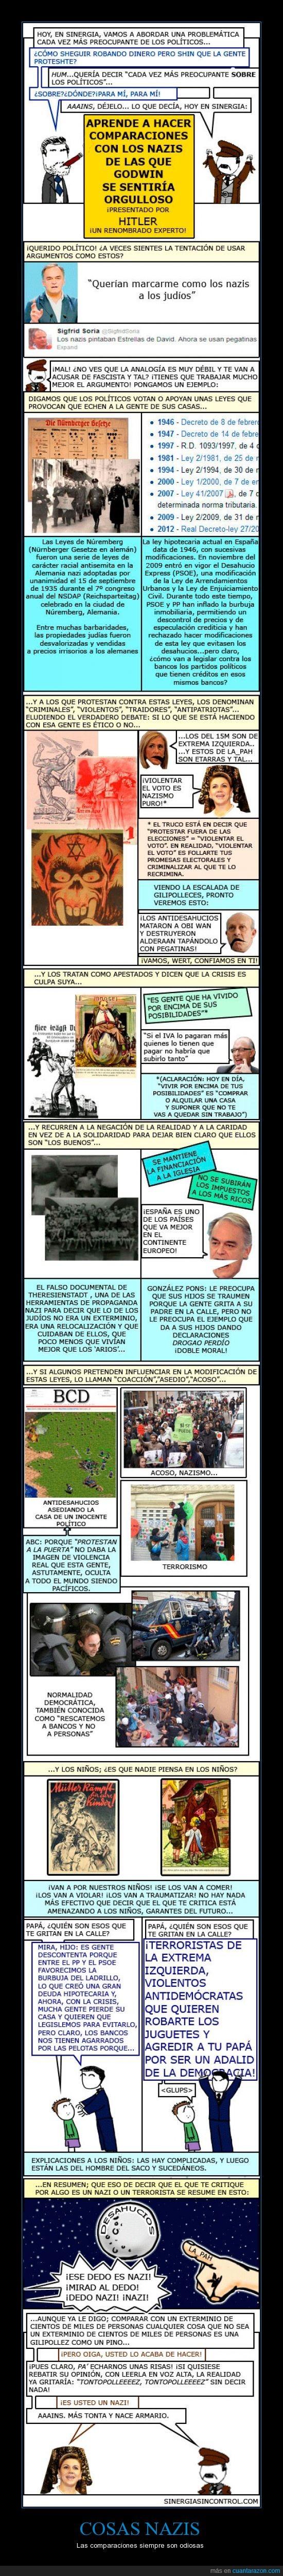 comparaciones odiosas,españa,nazis,políticos,sinergiasincontrol